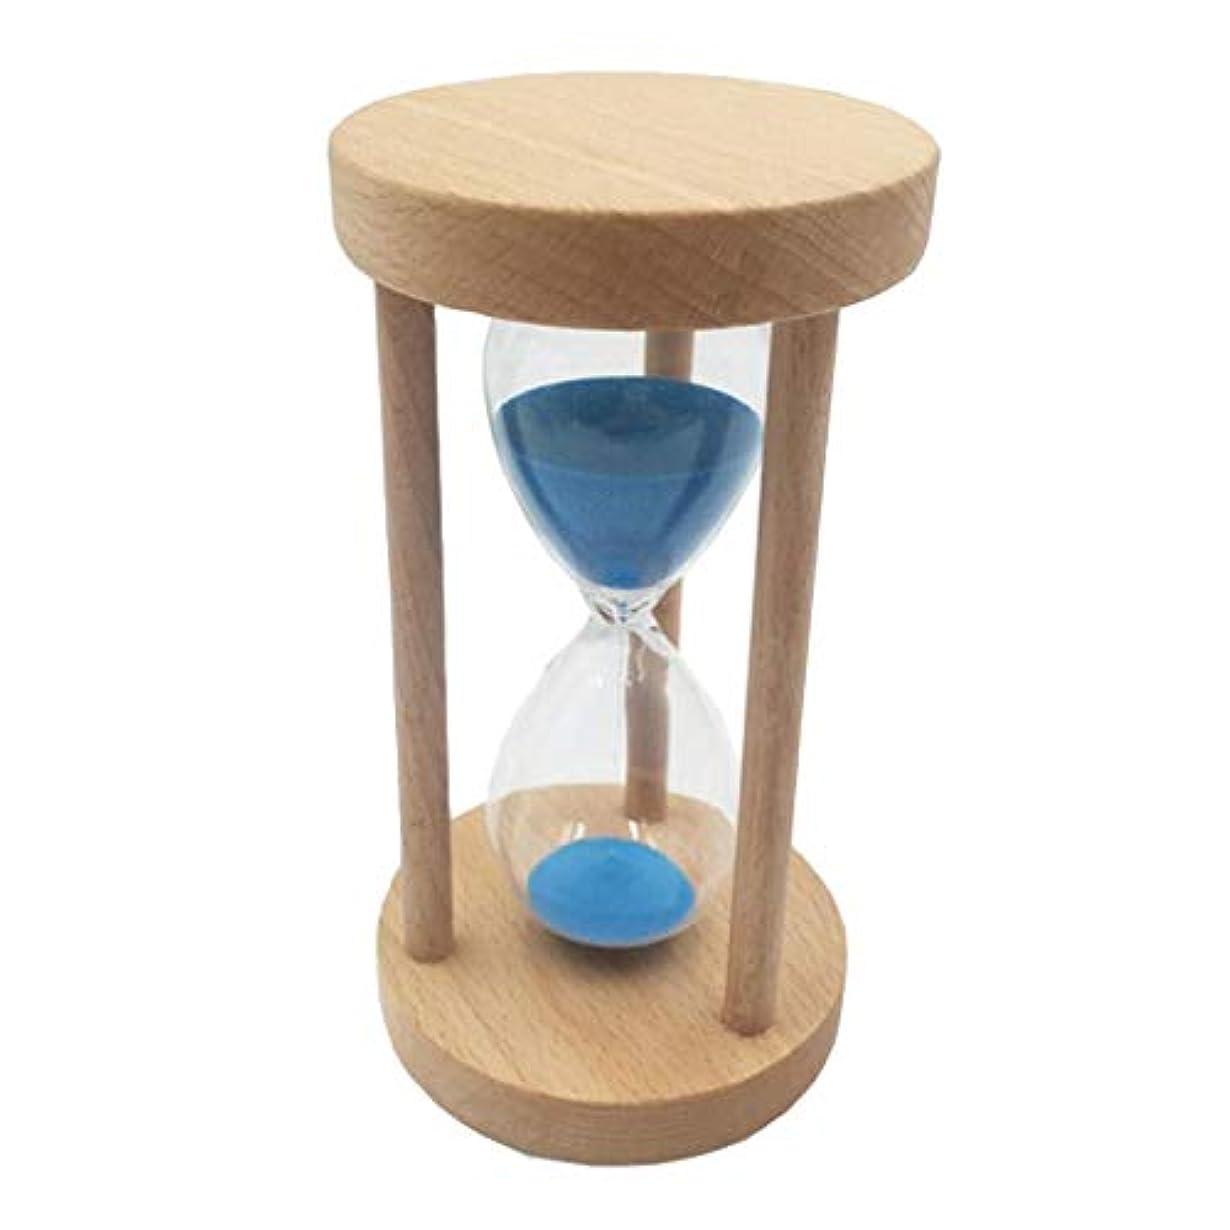 CUTICATE 砂時計 レストランタイマー ゲームタイマー 訓練砂時計 持ち運び便利 実用性 使いやすさ 全4種類 - 12分